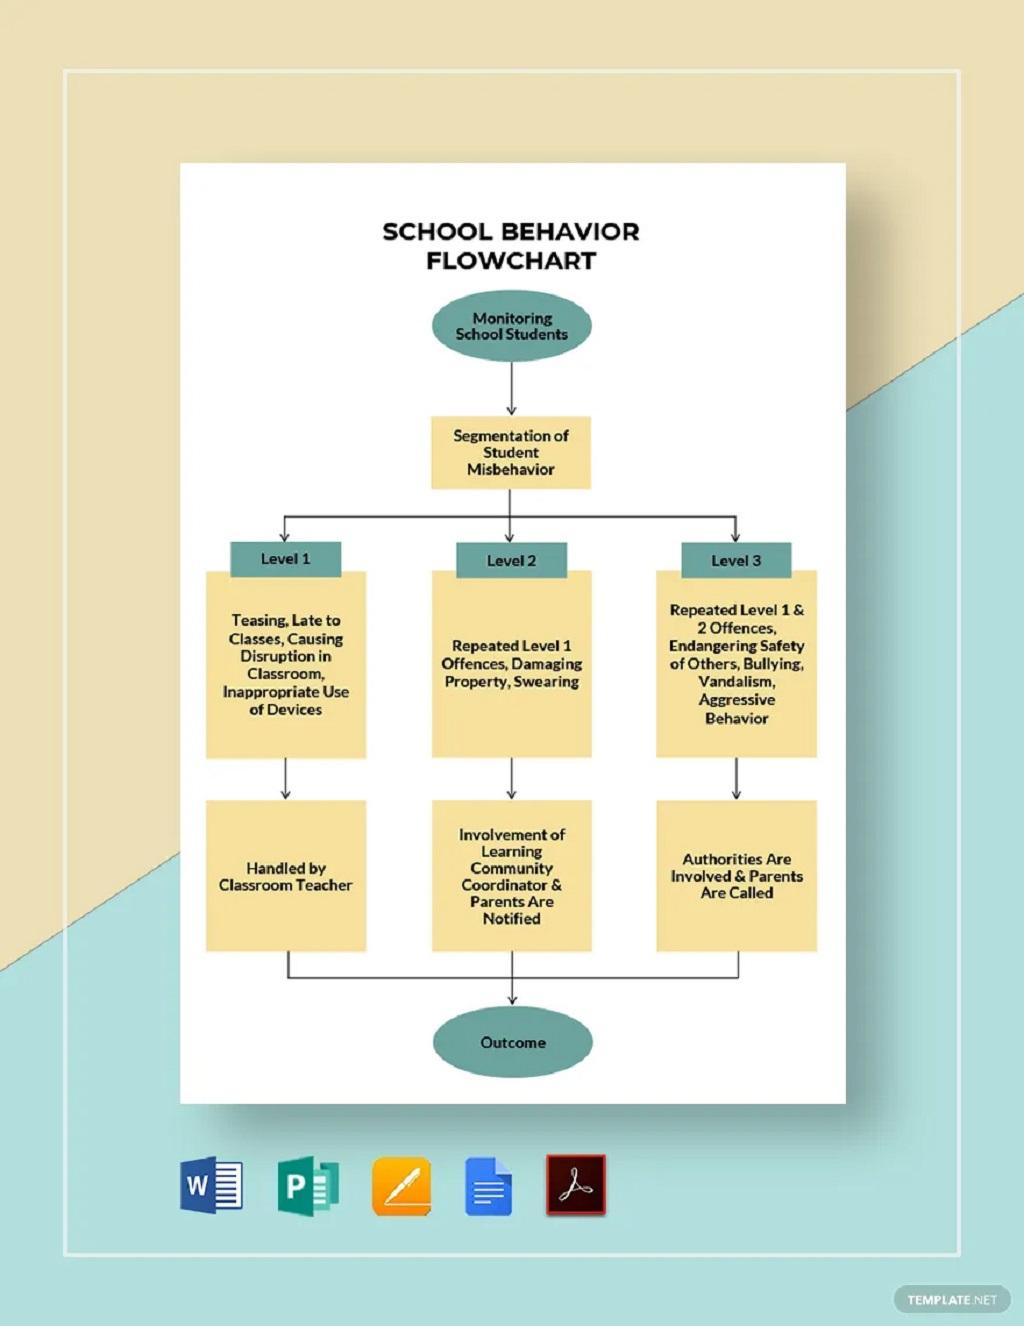 School Behavior Flowchart Template Sample Chart Printable Charts For Home Pdf Preschool Teachers Classroom  Samples Large